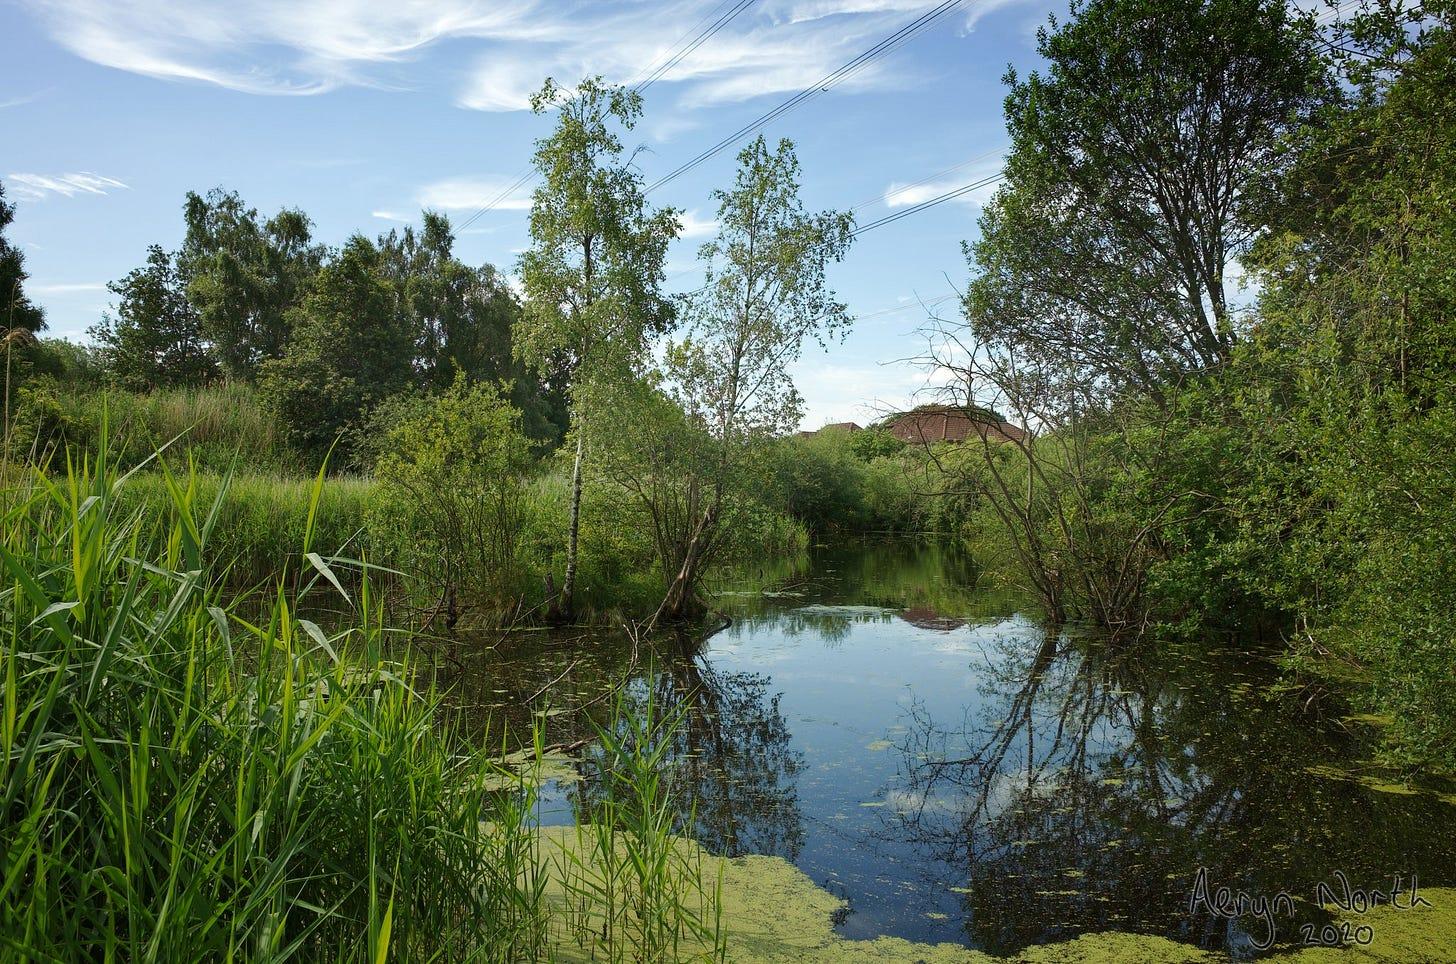 20200712-1045-03-pond-jacksons-brickworks-by-Aeryn-North.jpg